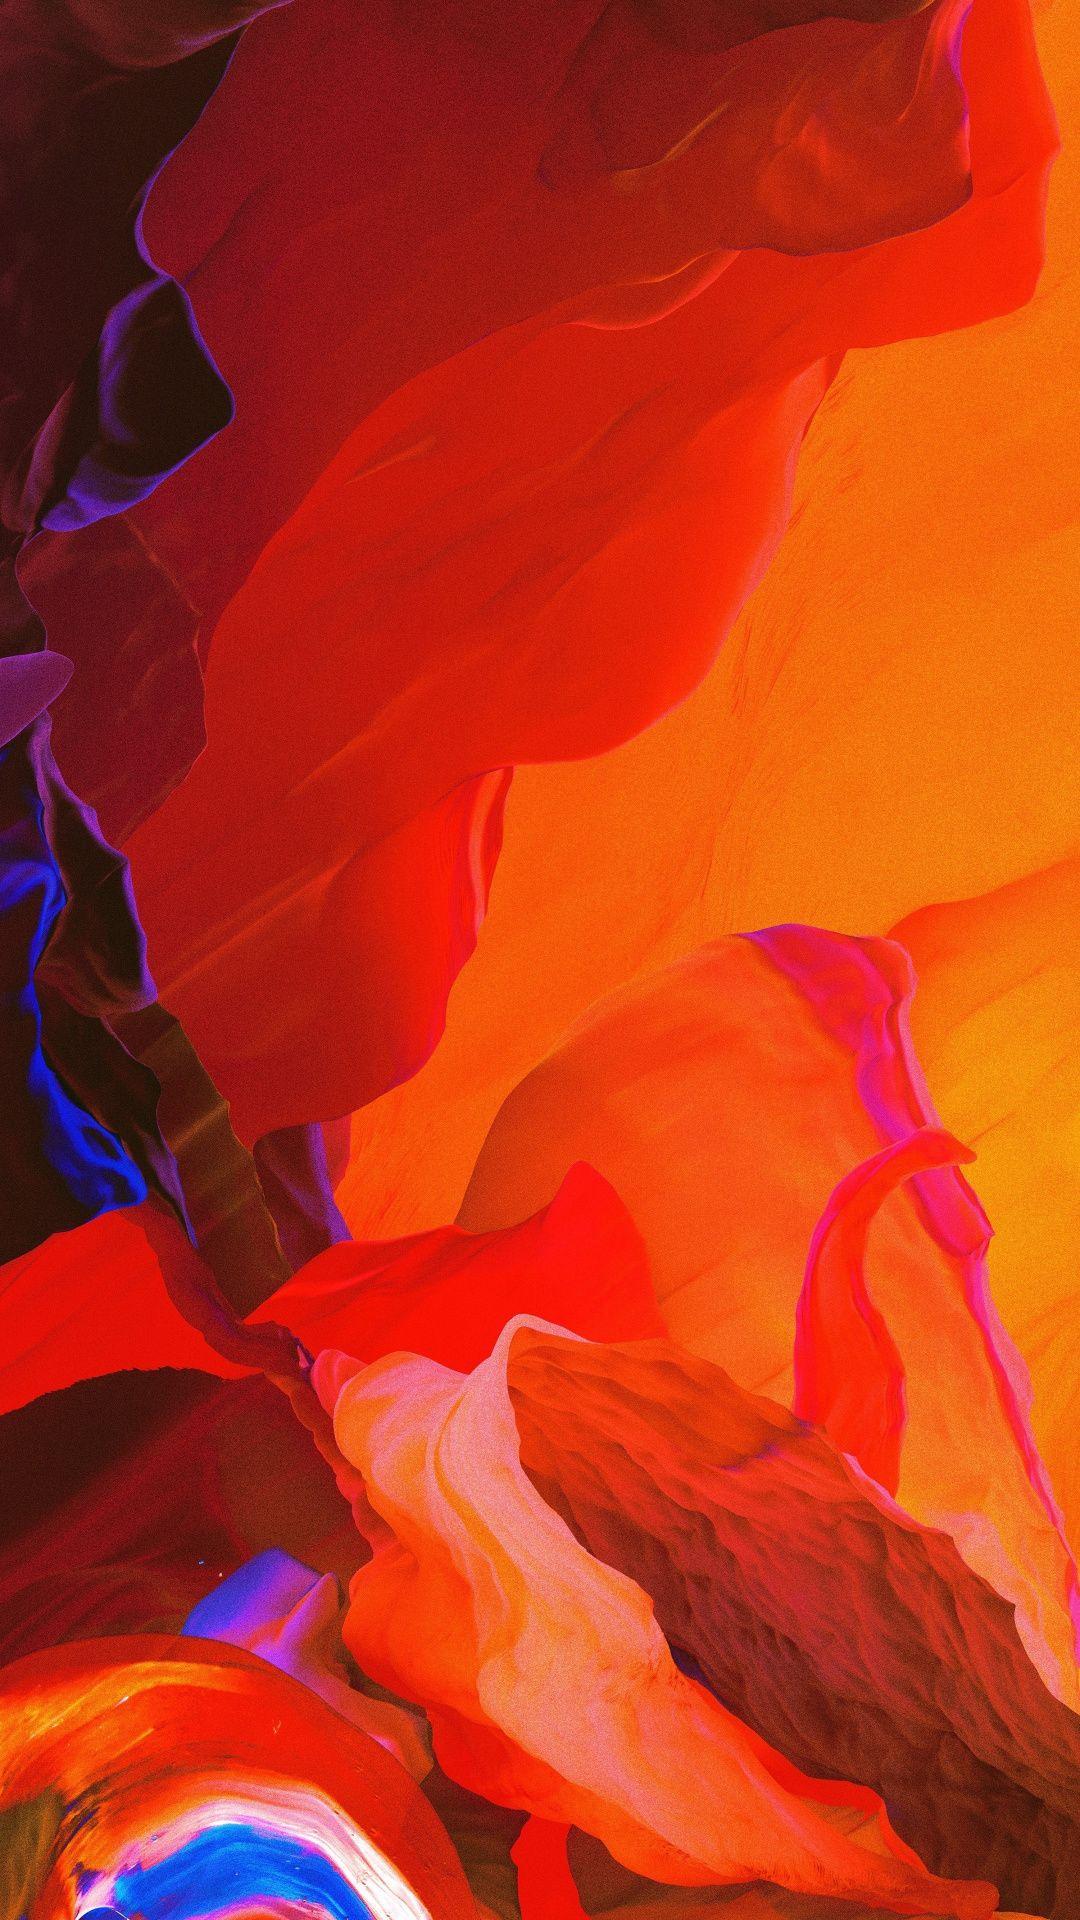 Abstract Fire Vivid Colors 1080x1920 Wallpaper Abstract Art Photo Prints Abstract Art Prints